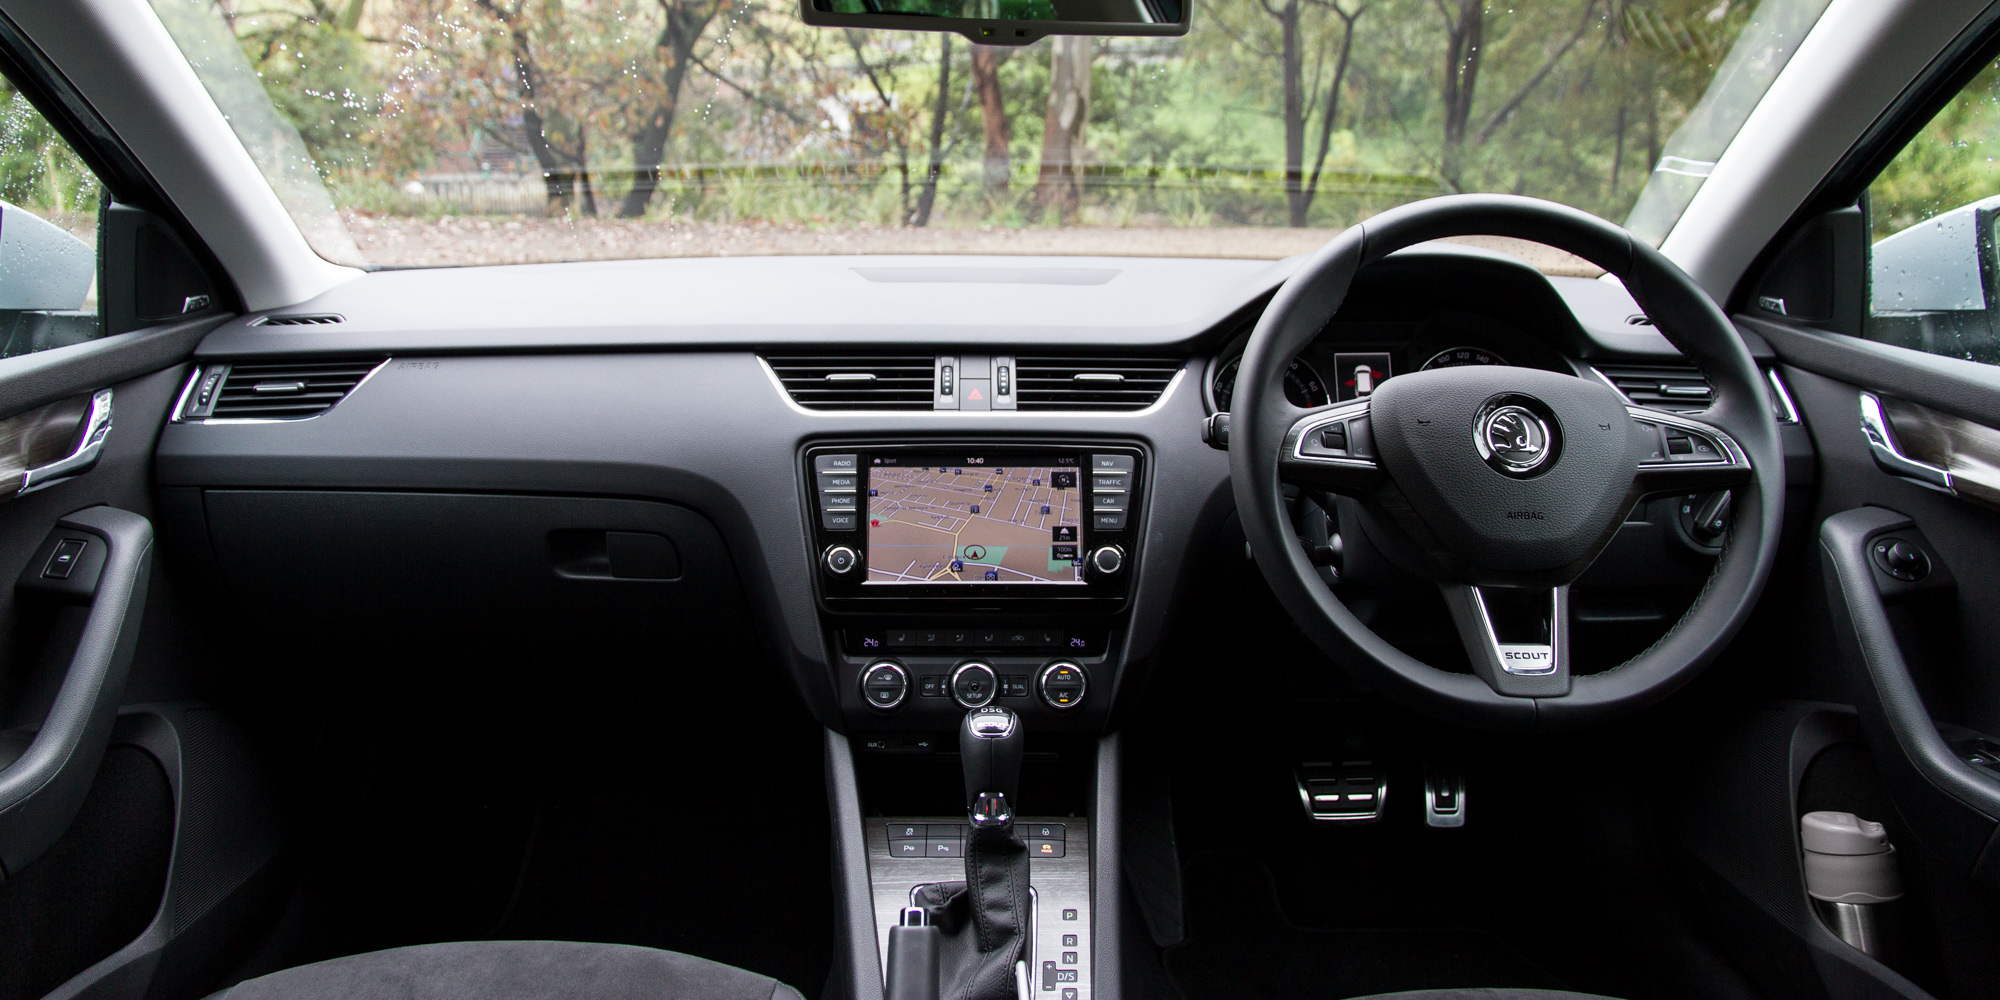 2016 Skoda Octavia Scout Interior Dashboard